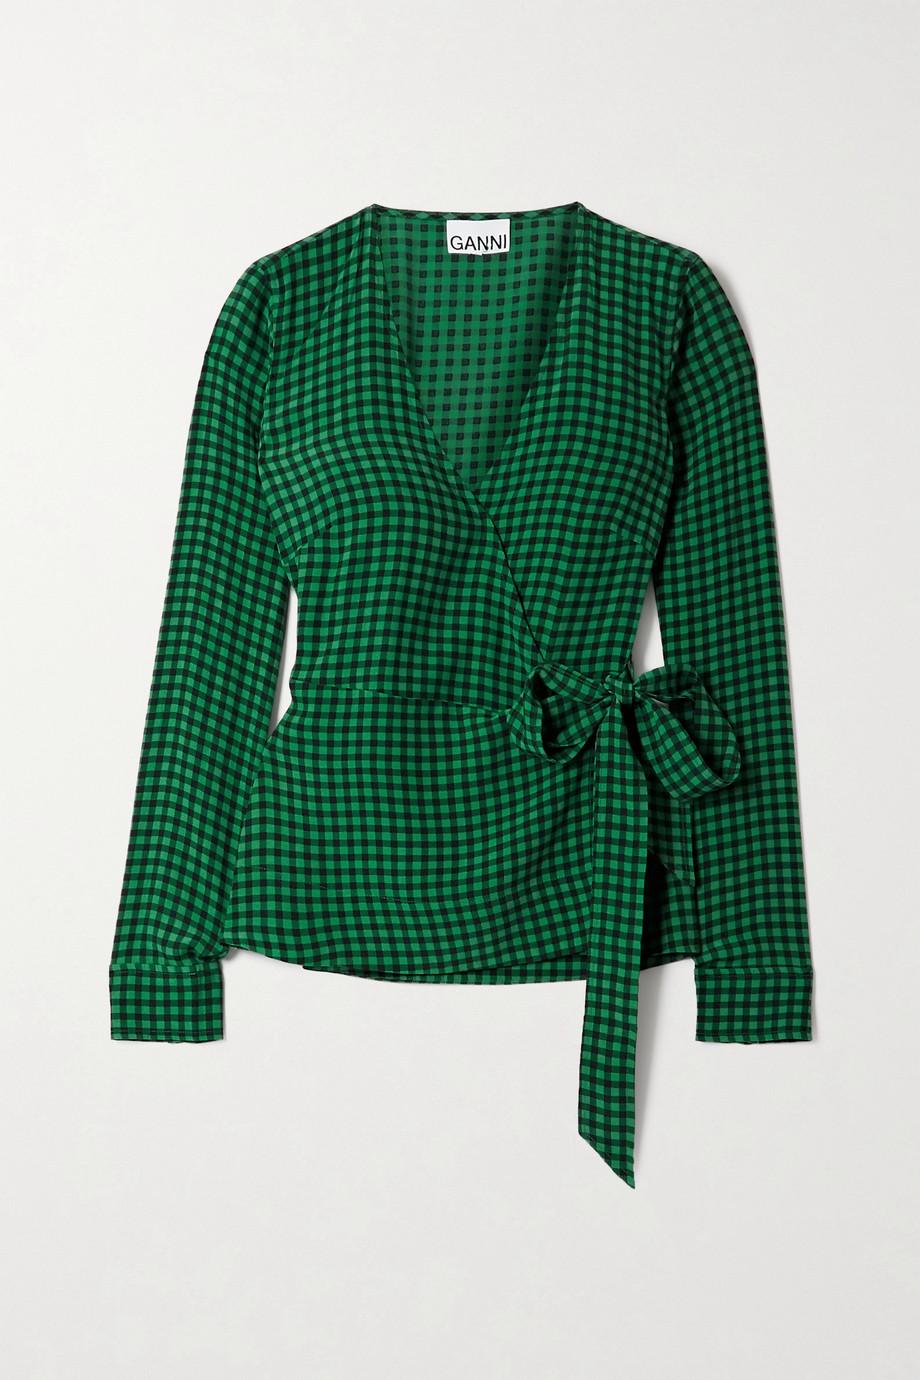 GANNI 方格绉纱围裹式上衣